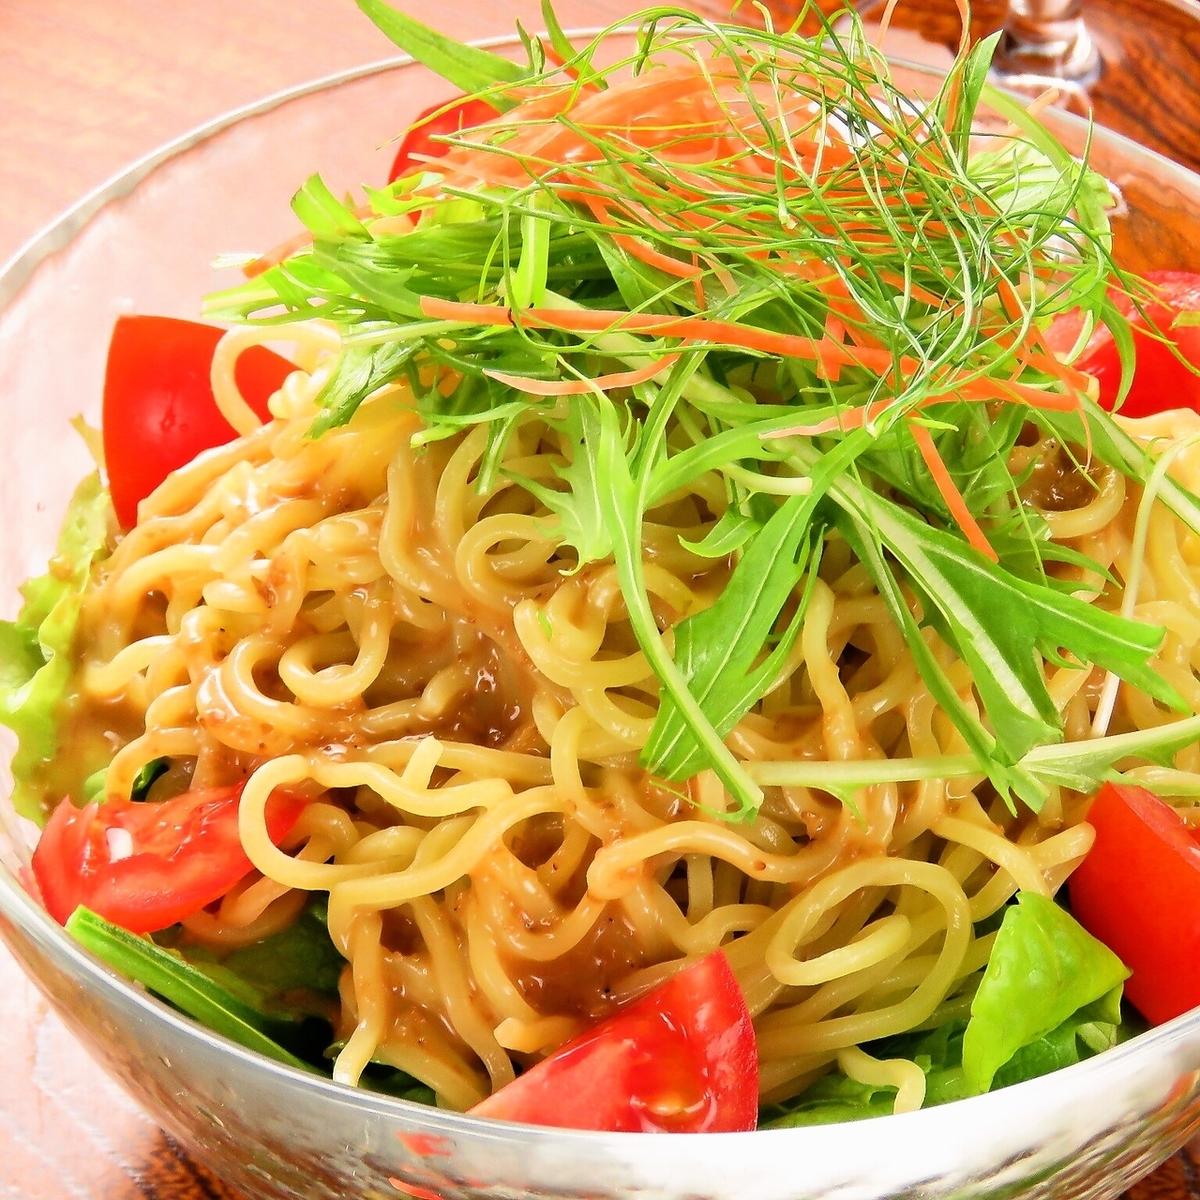 Roam taste! Ramen salad